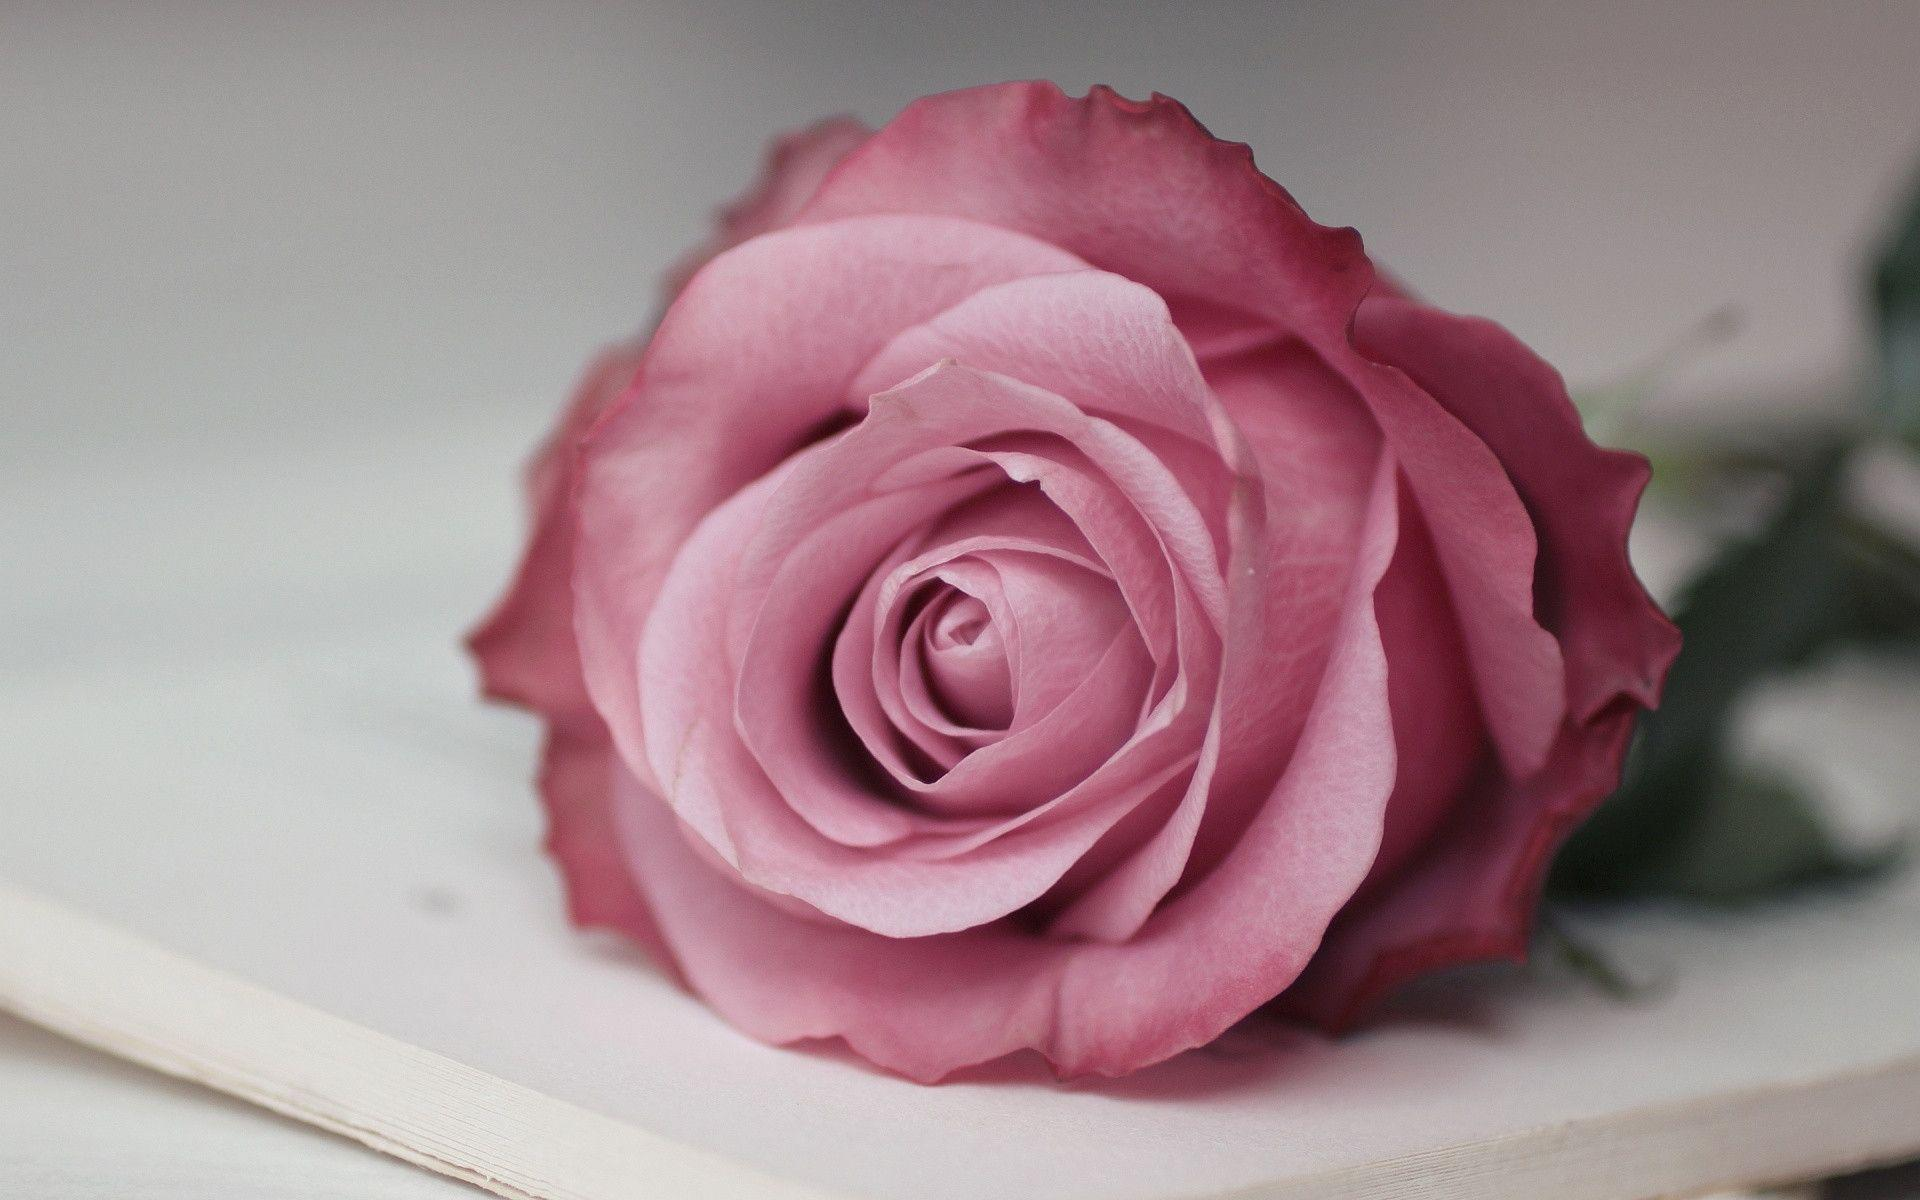 Pink Rose Wallpapers - Wallpaper Cave